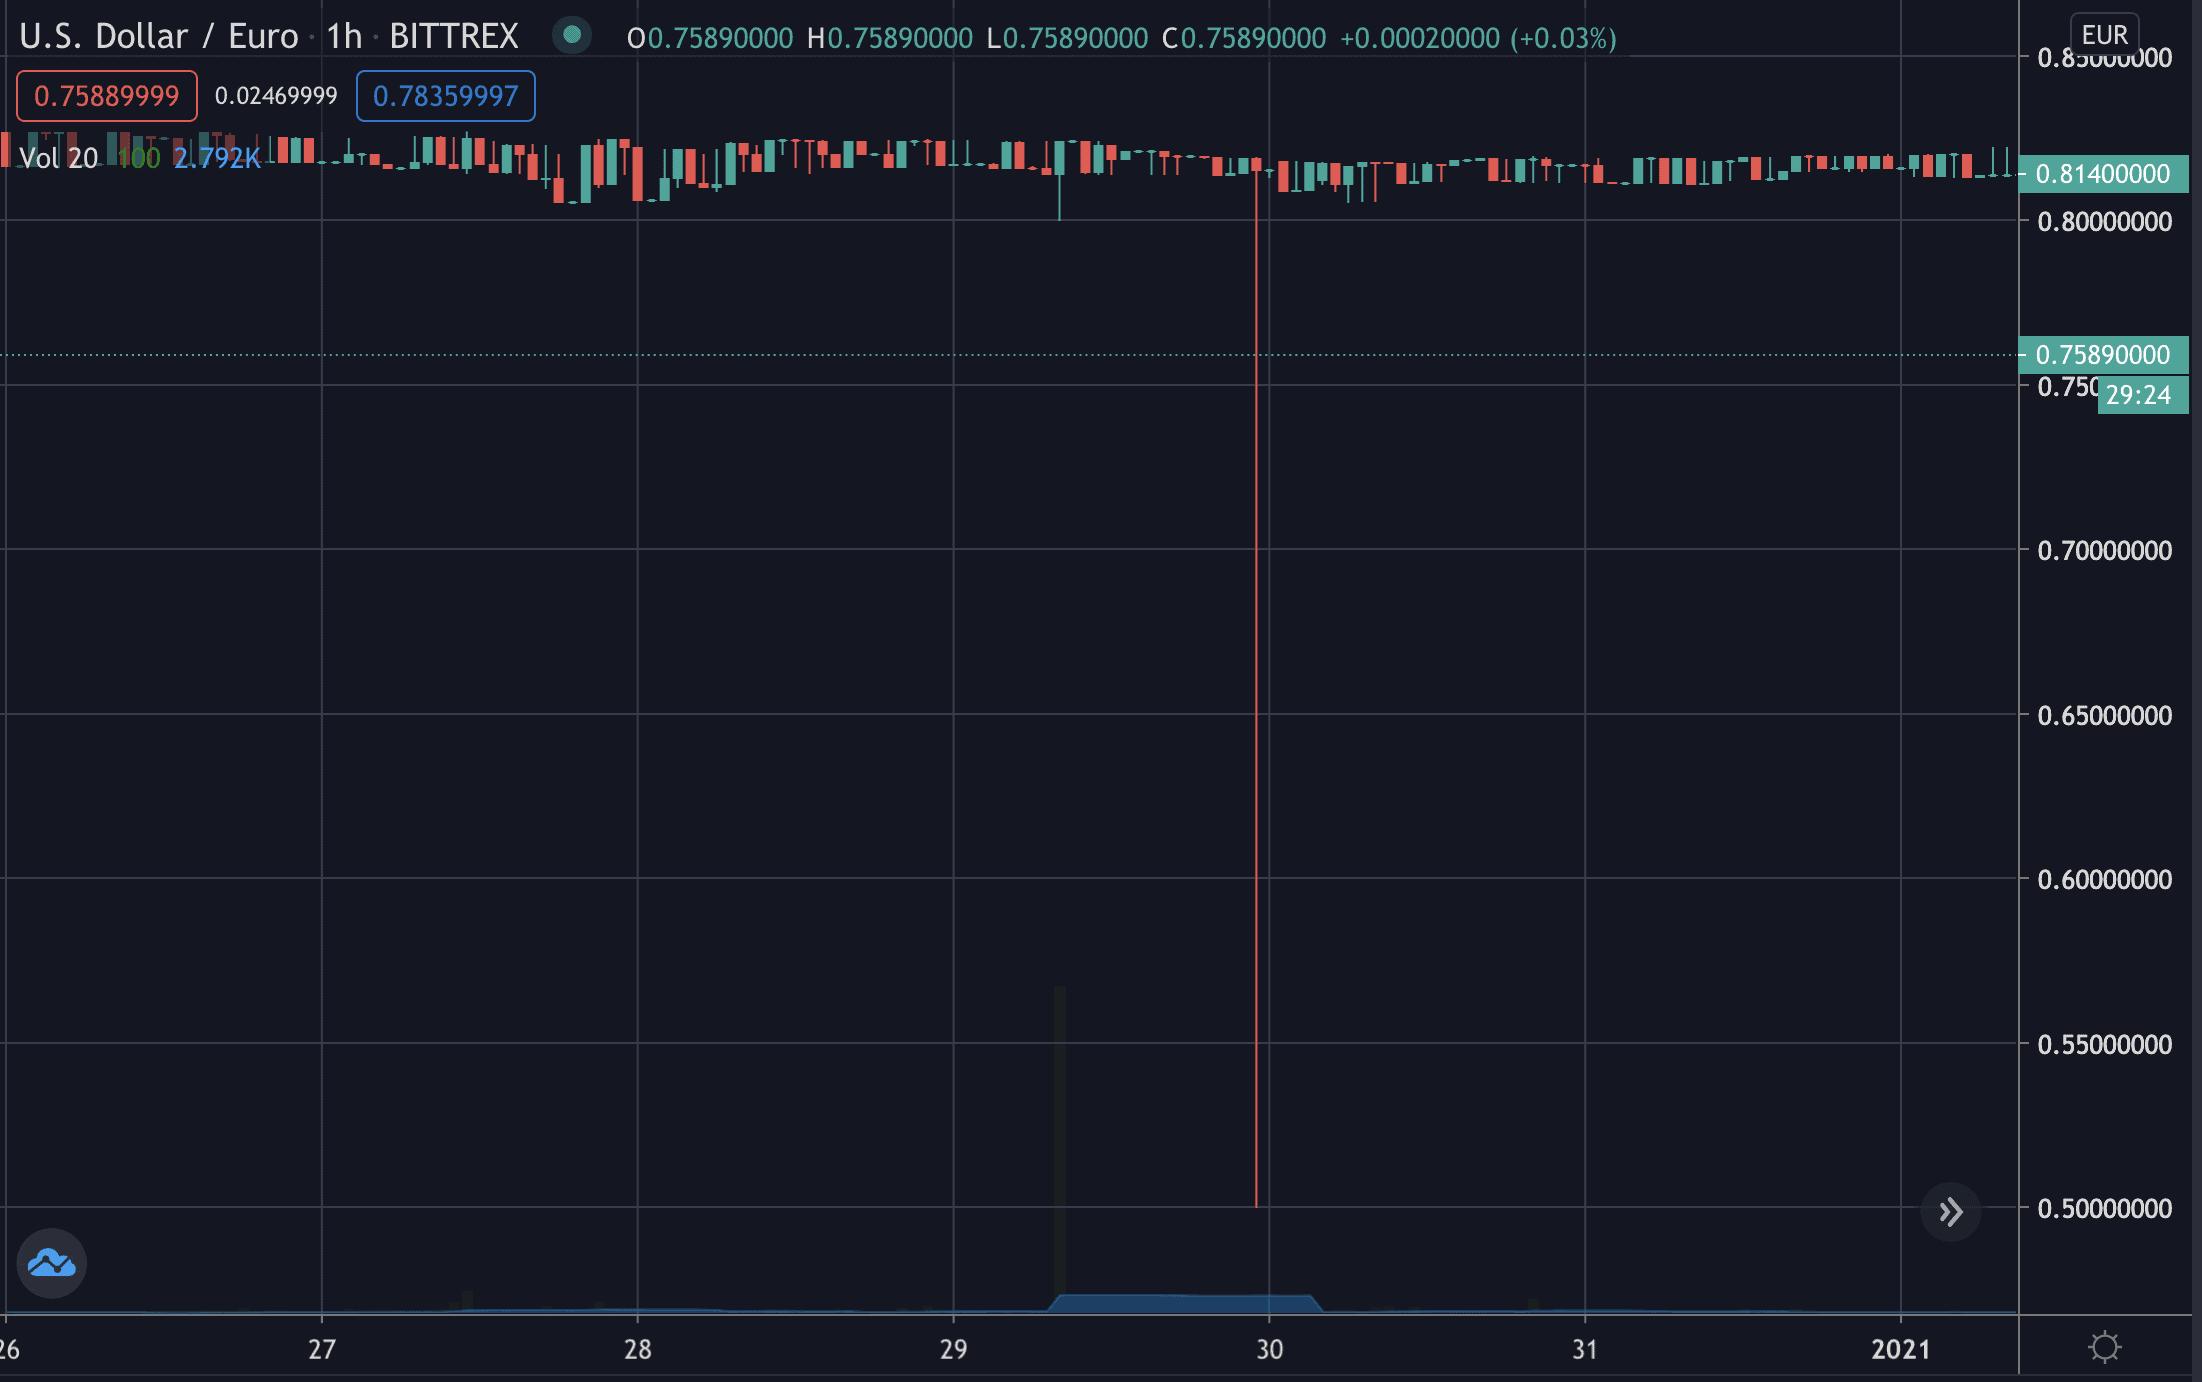 USD/EUR flash crash on Bittrex, Jan 2021